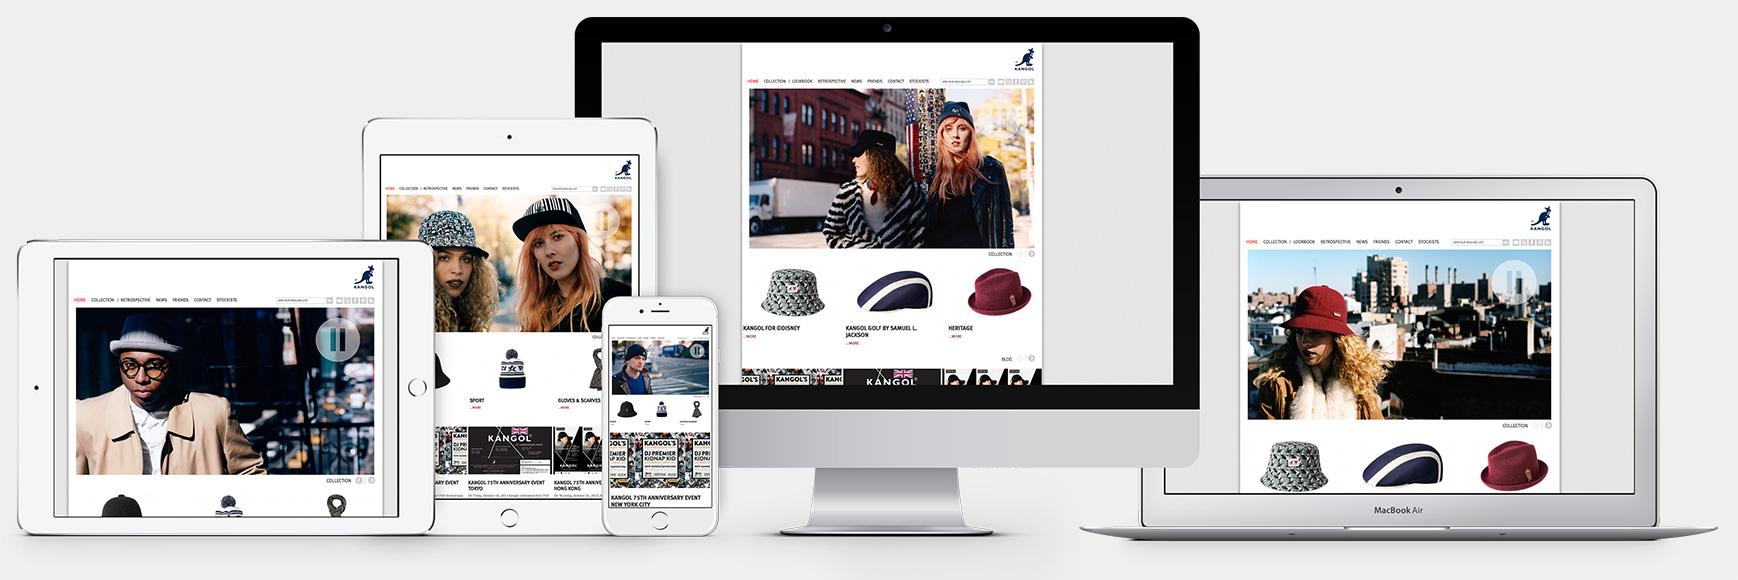 Kangol responsive web design